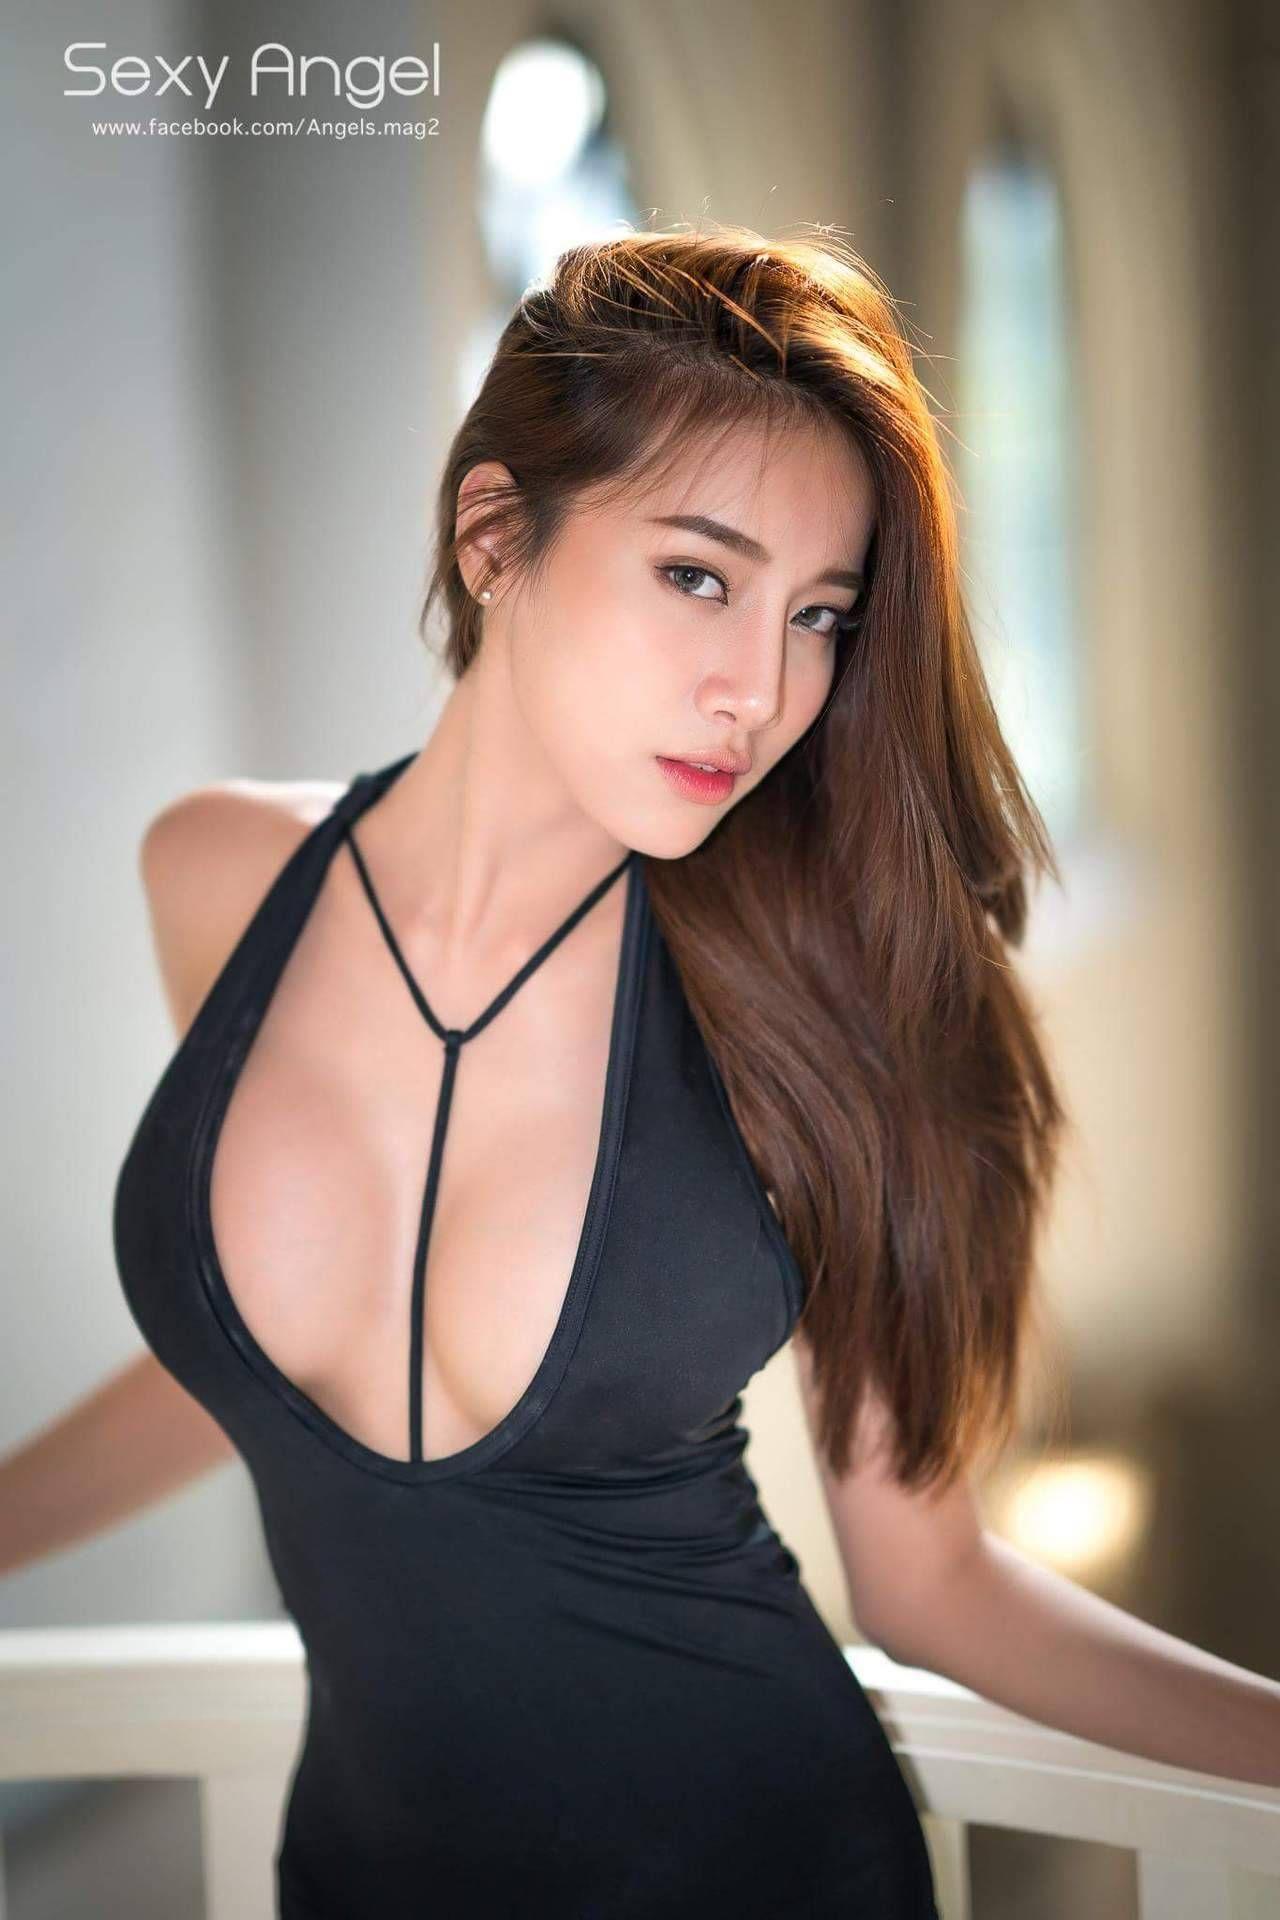 Sideboobs Raquel Zimmermann nudes (75 foto and video), Pussy, Bikini, Selfie, cleavage 2019